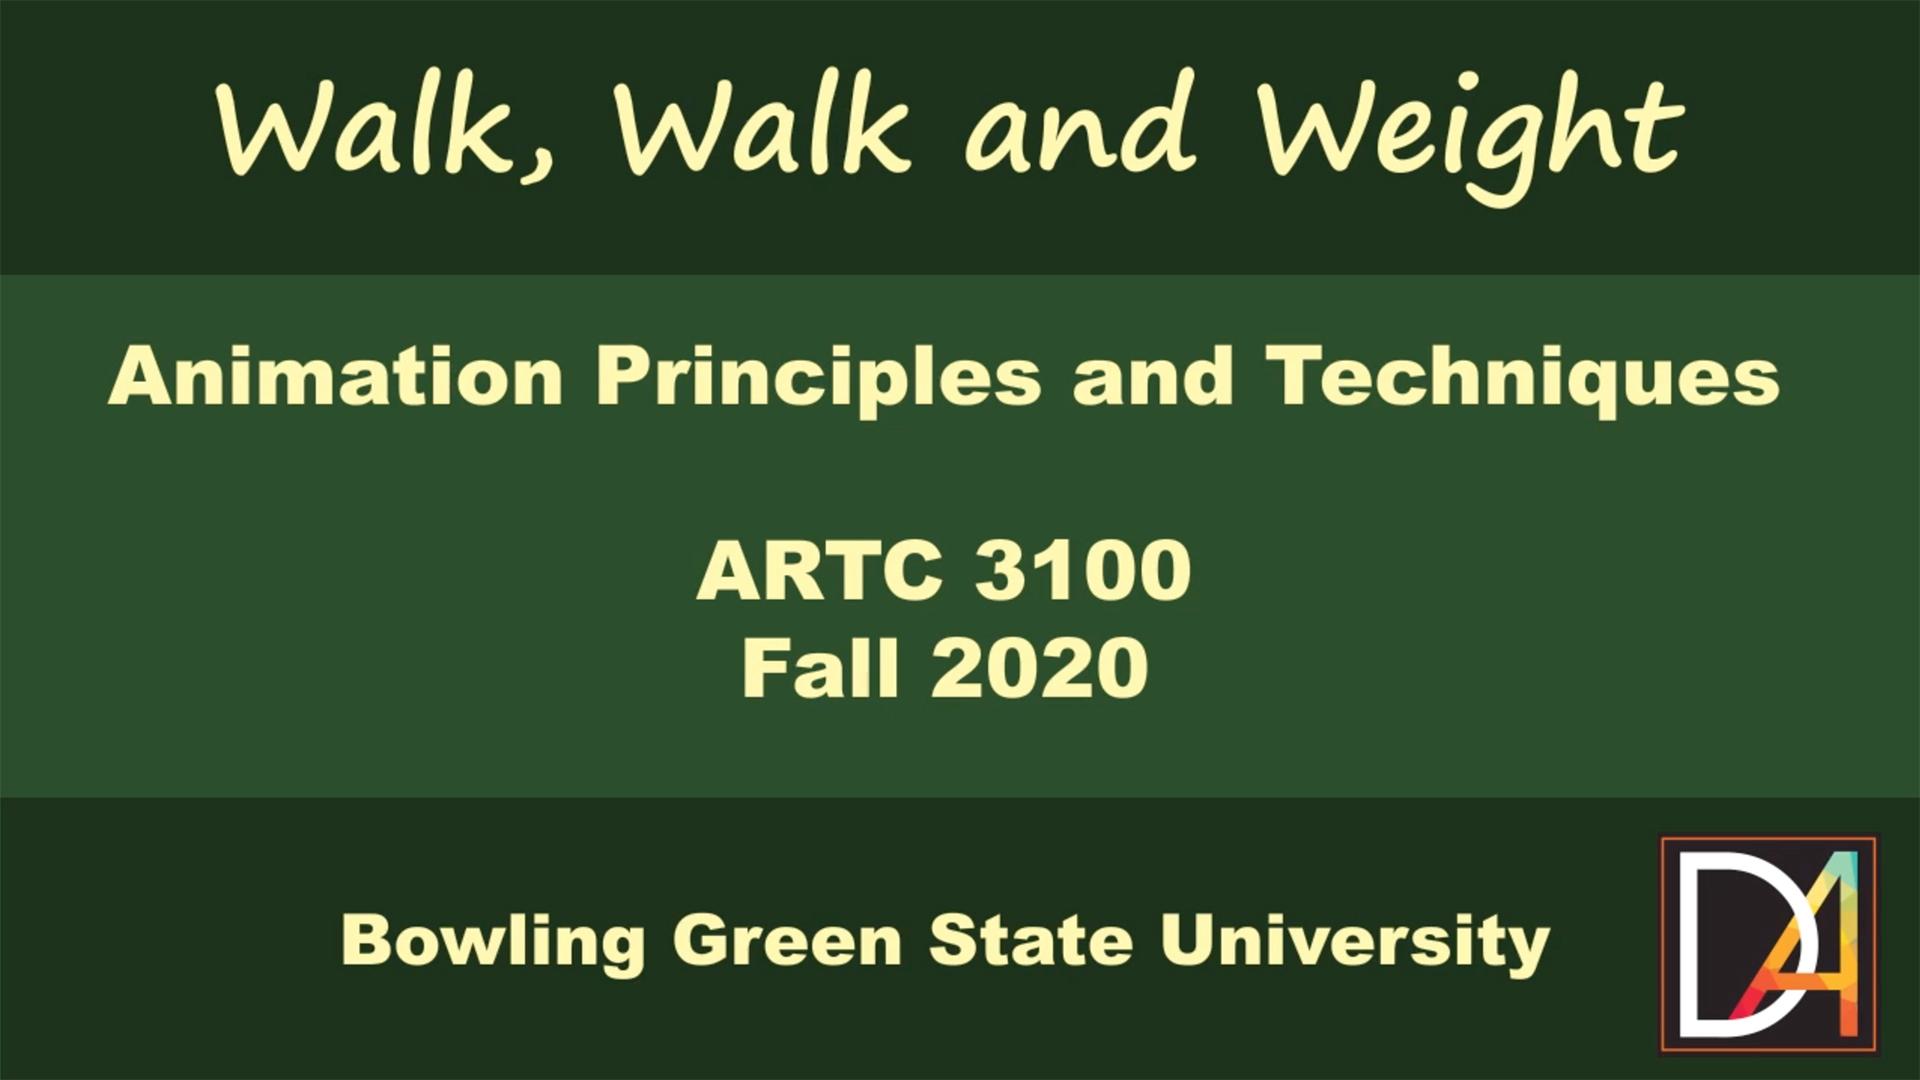 BGSU Animation Students, Walk, Walk, Weight